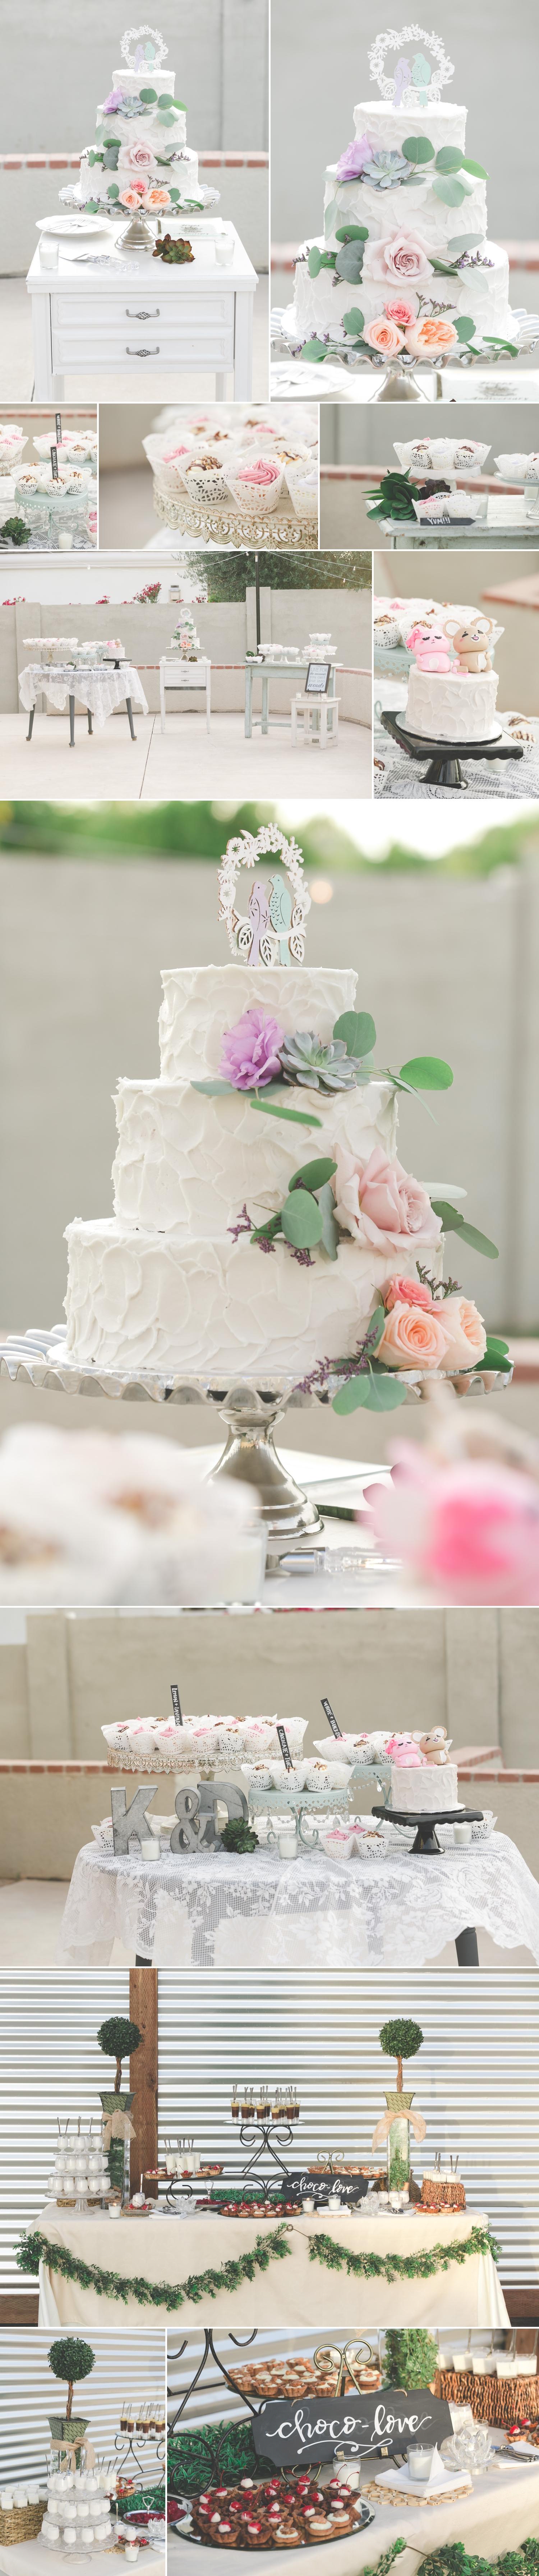 Krassa Wedding blog 5.jpg